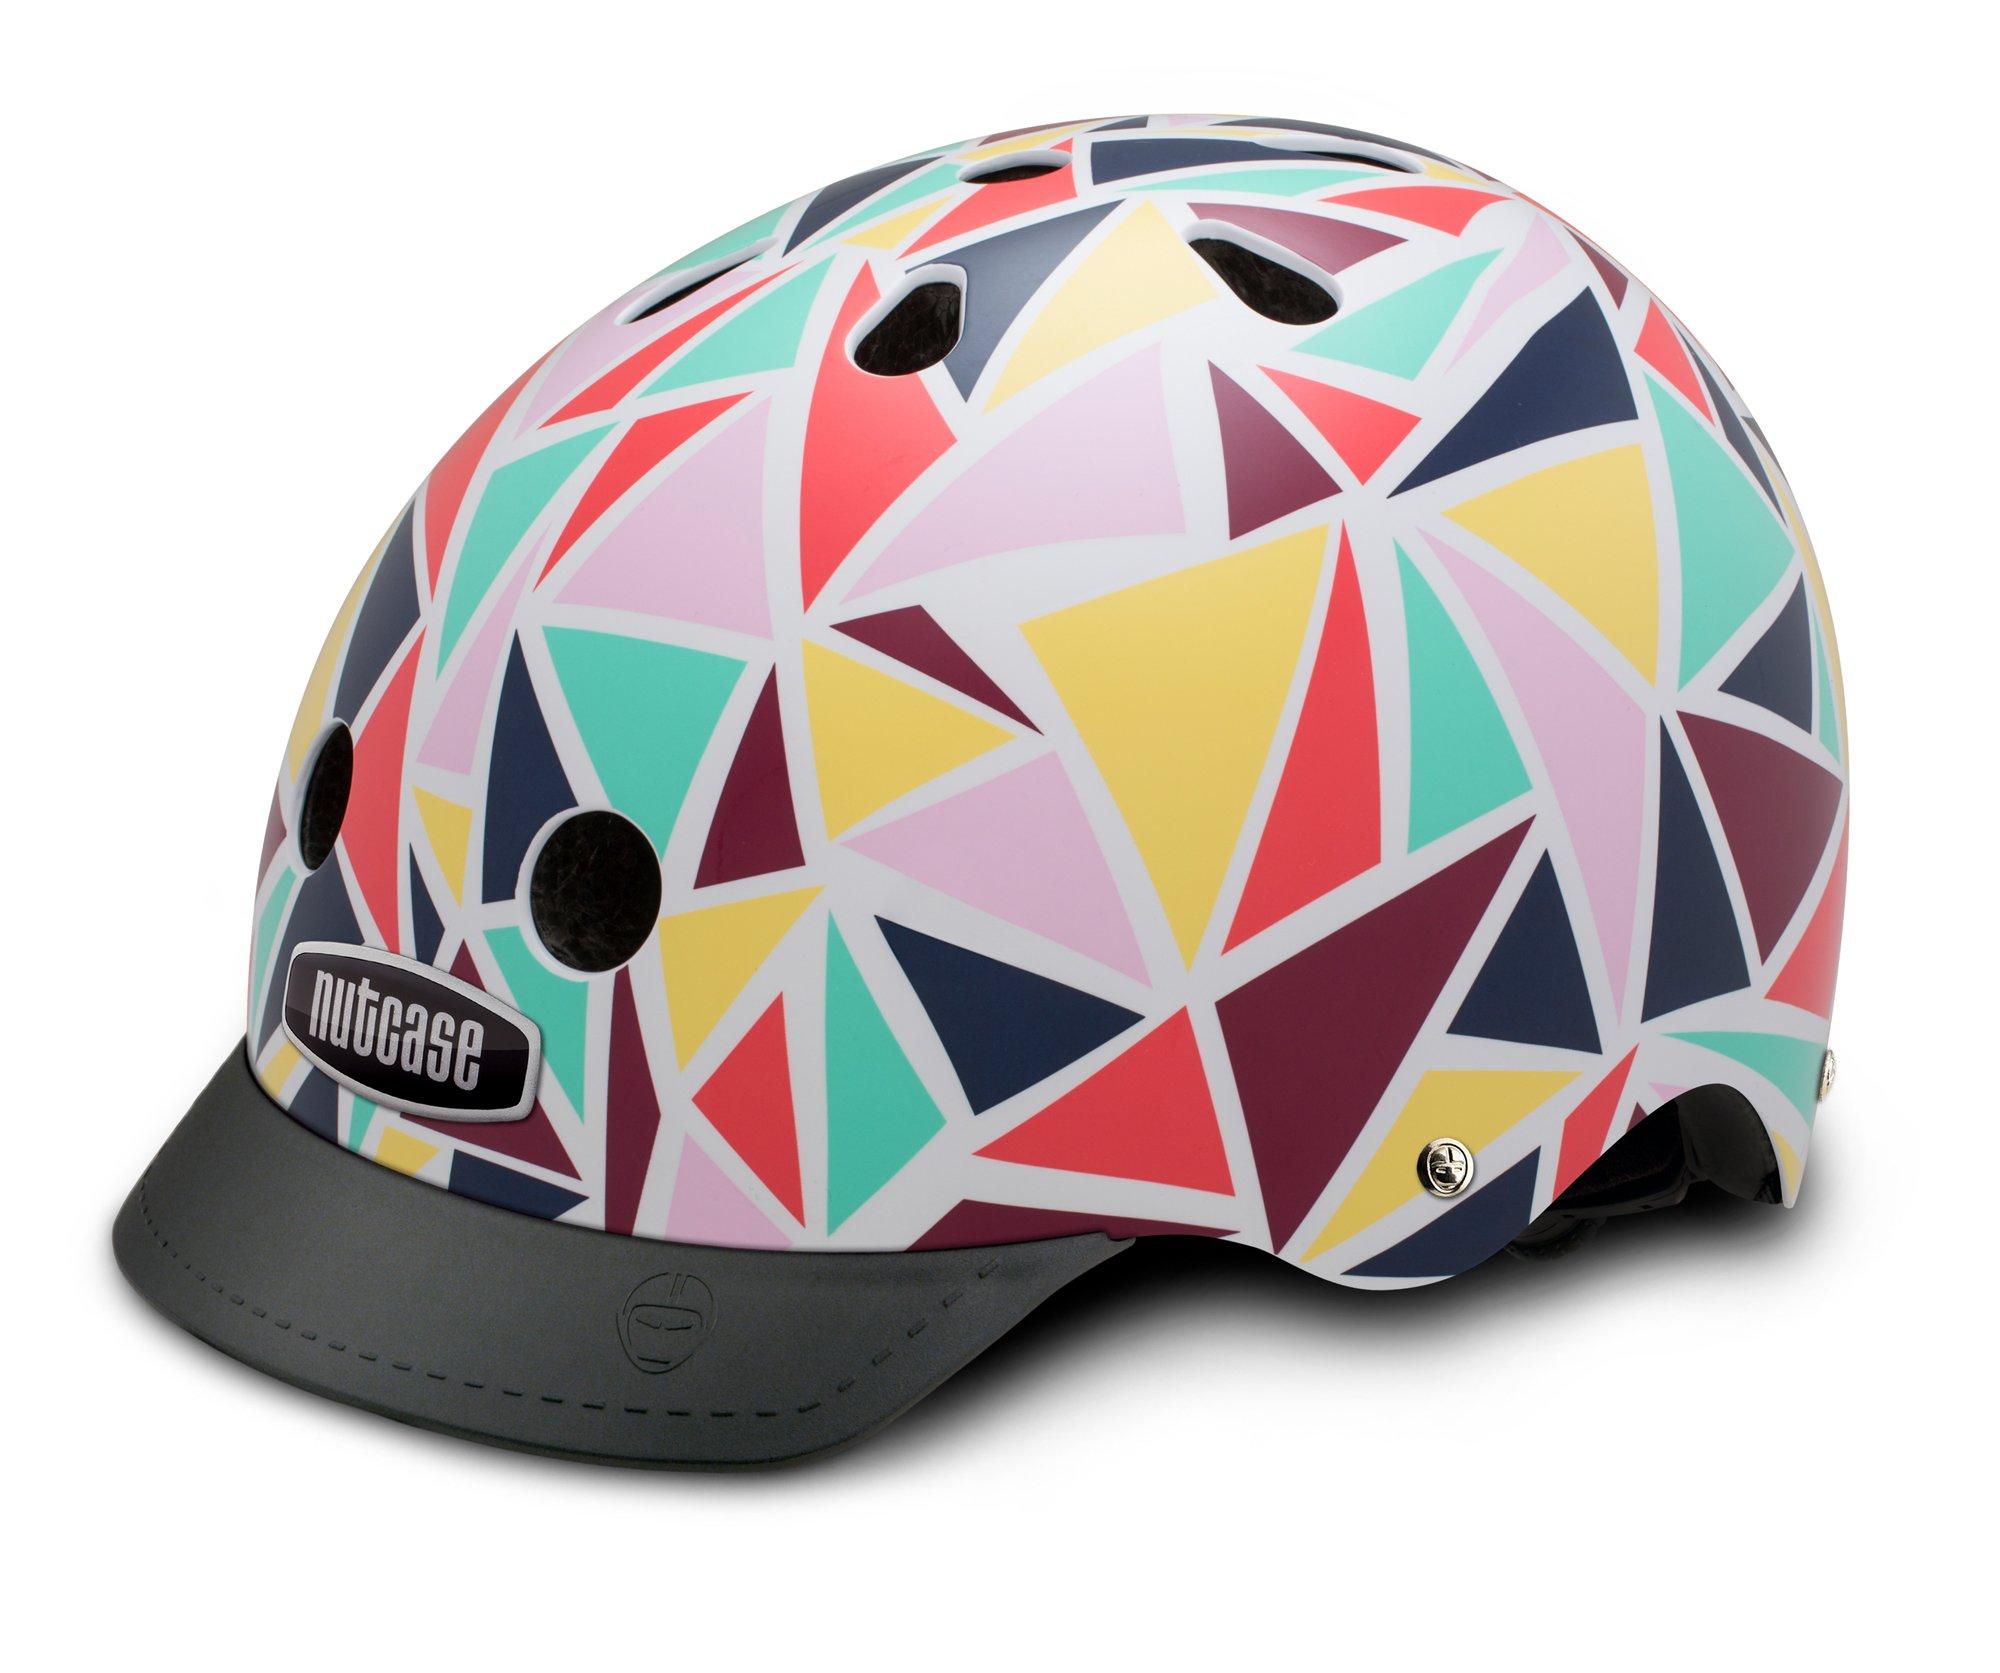 Nutcase Patterned Street Helmet Kaleidoscope